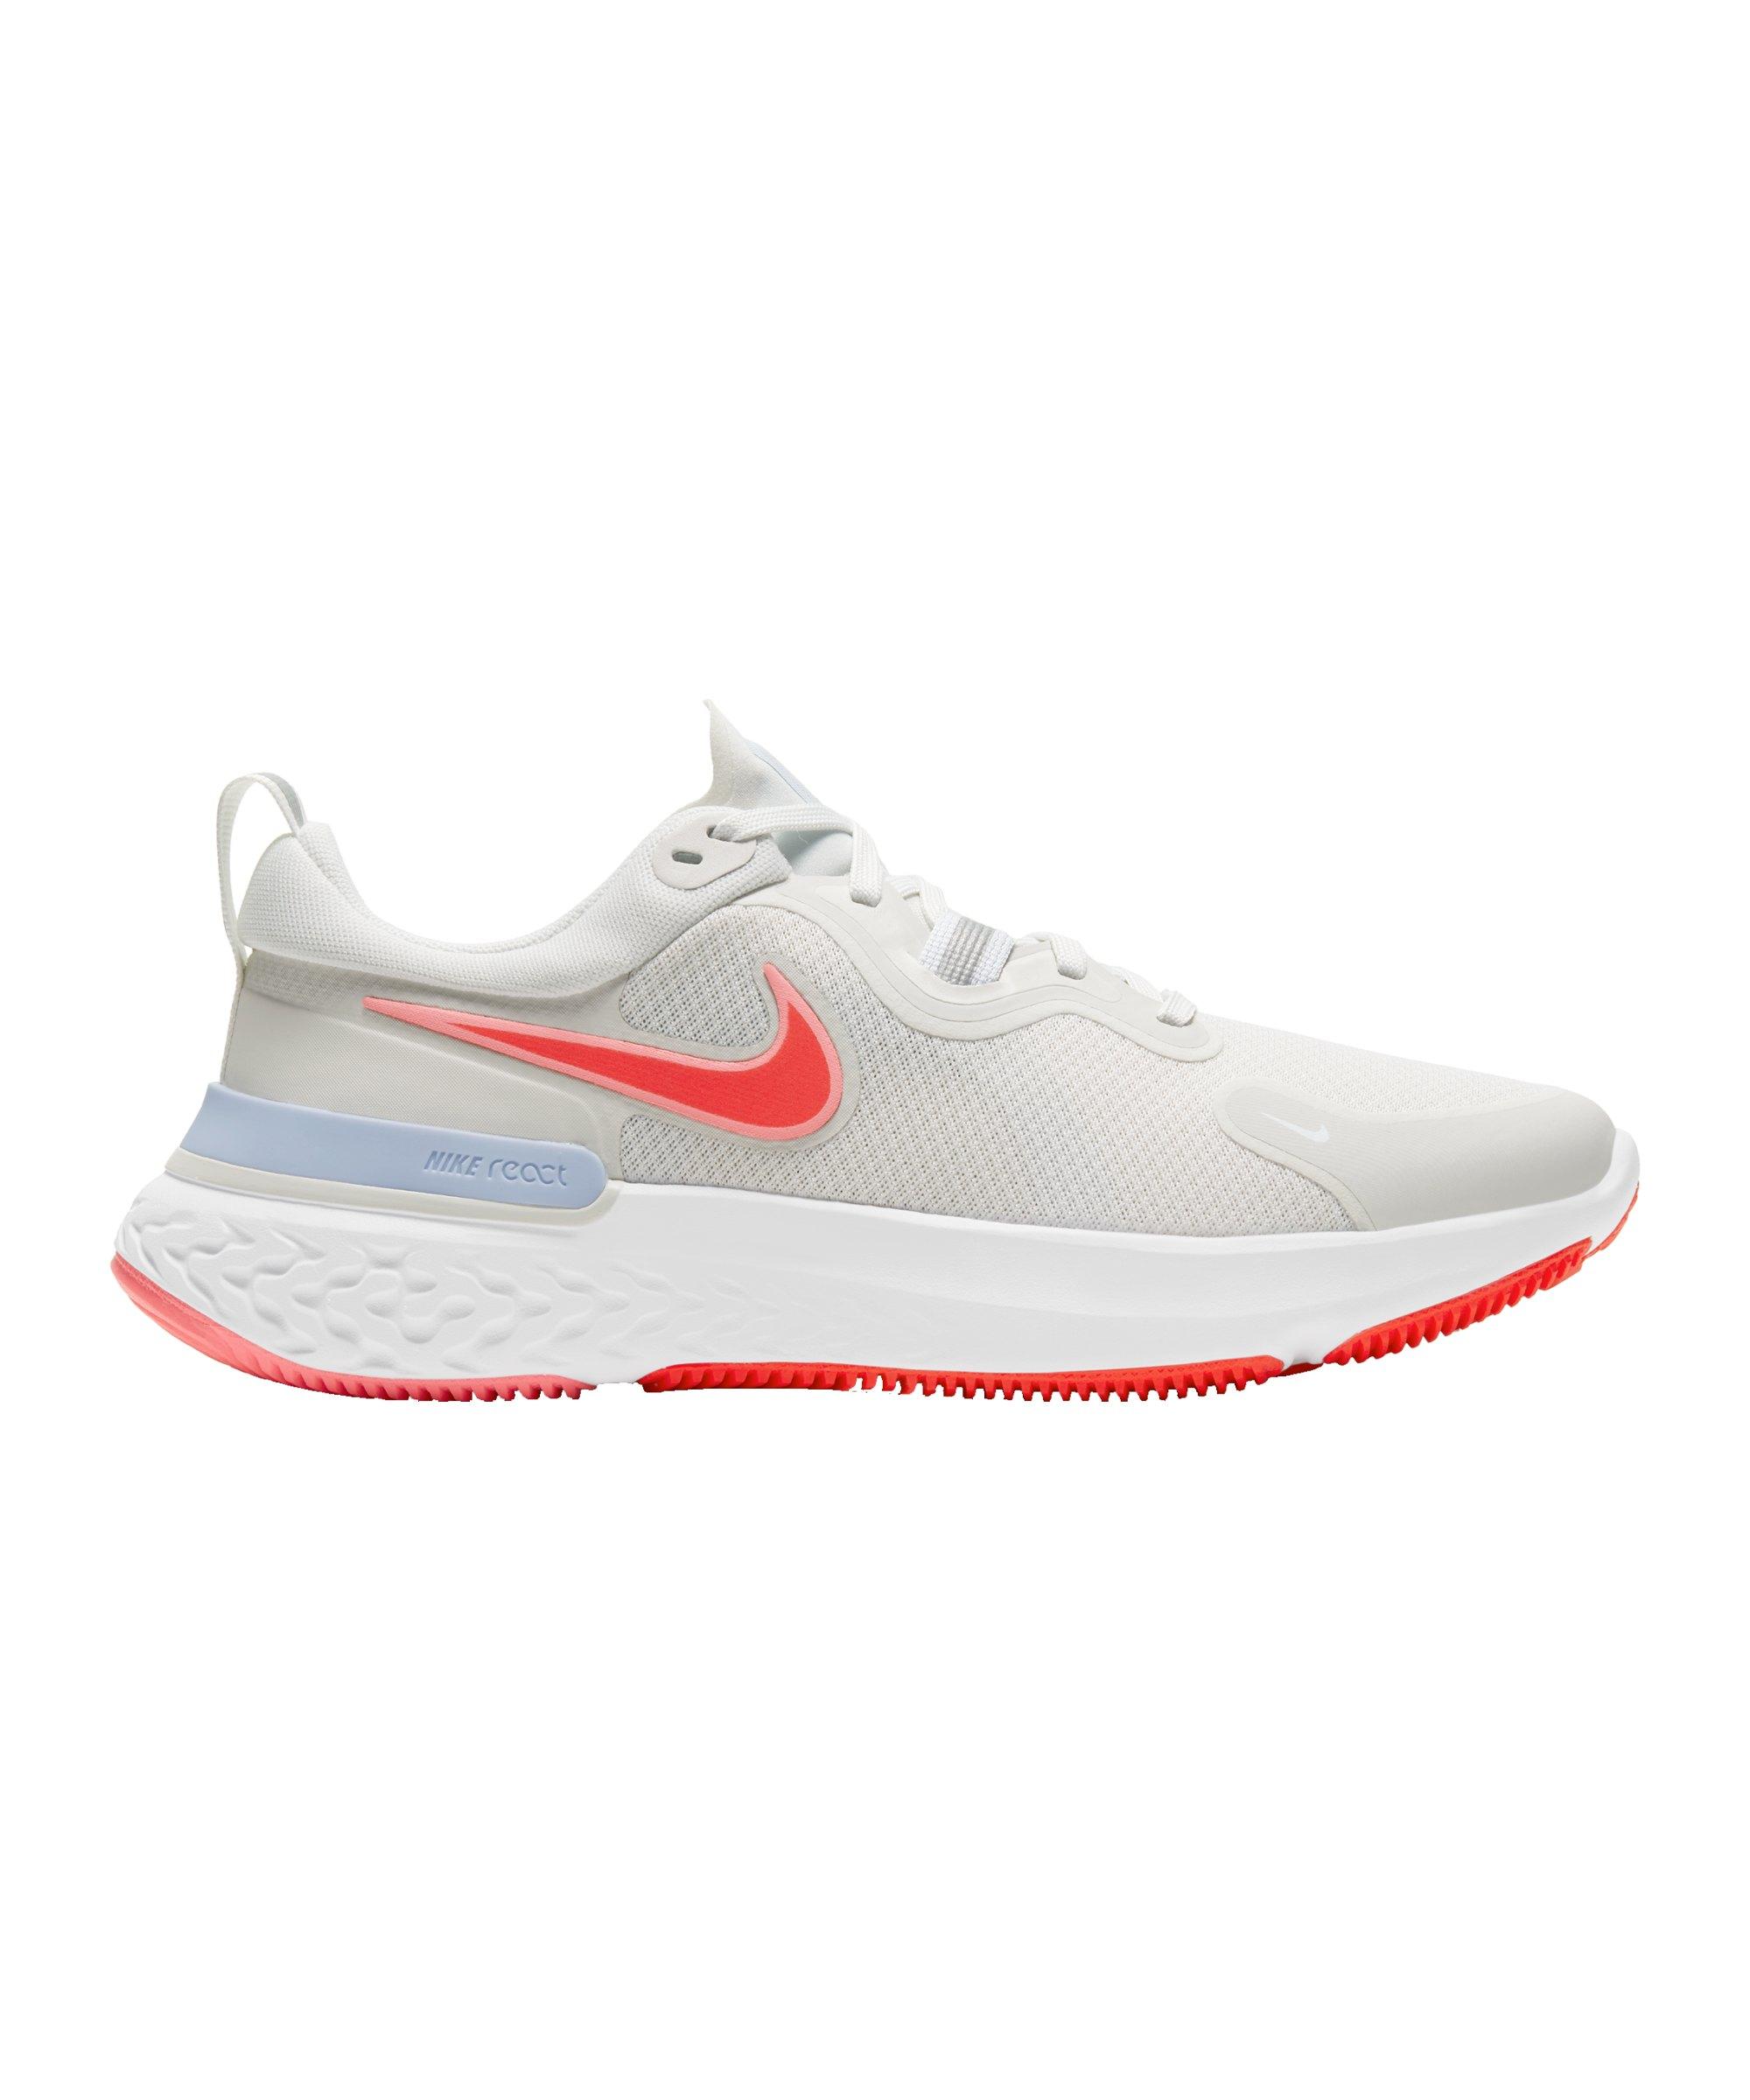 Nike React Miler Running Damen Beige Rot F010 - beige